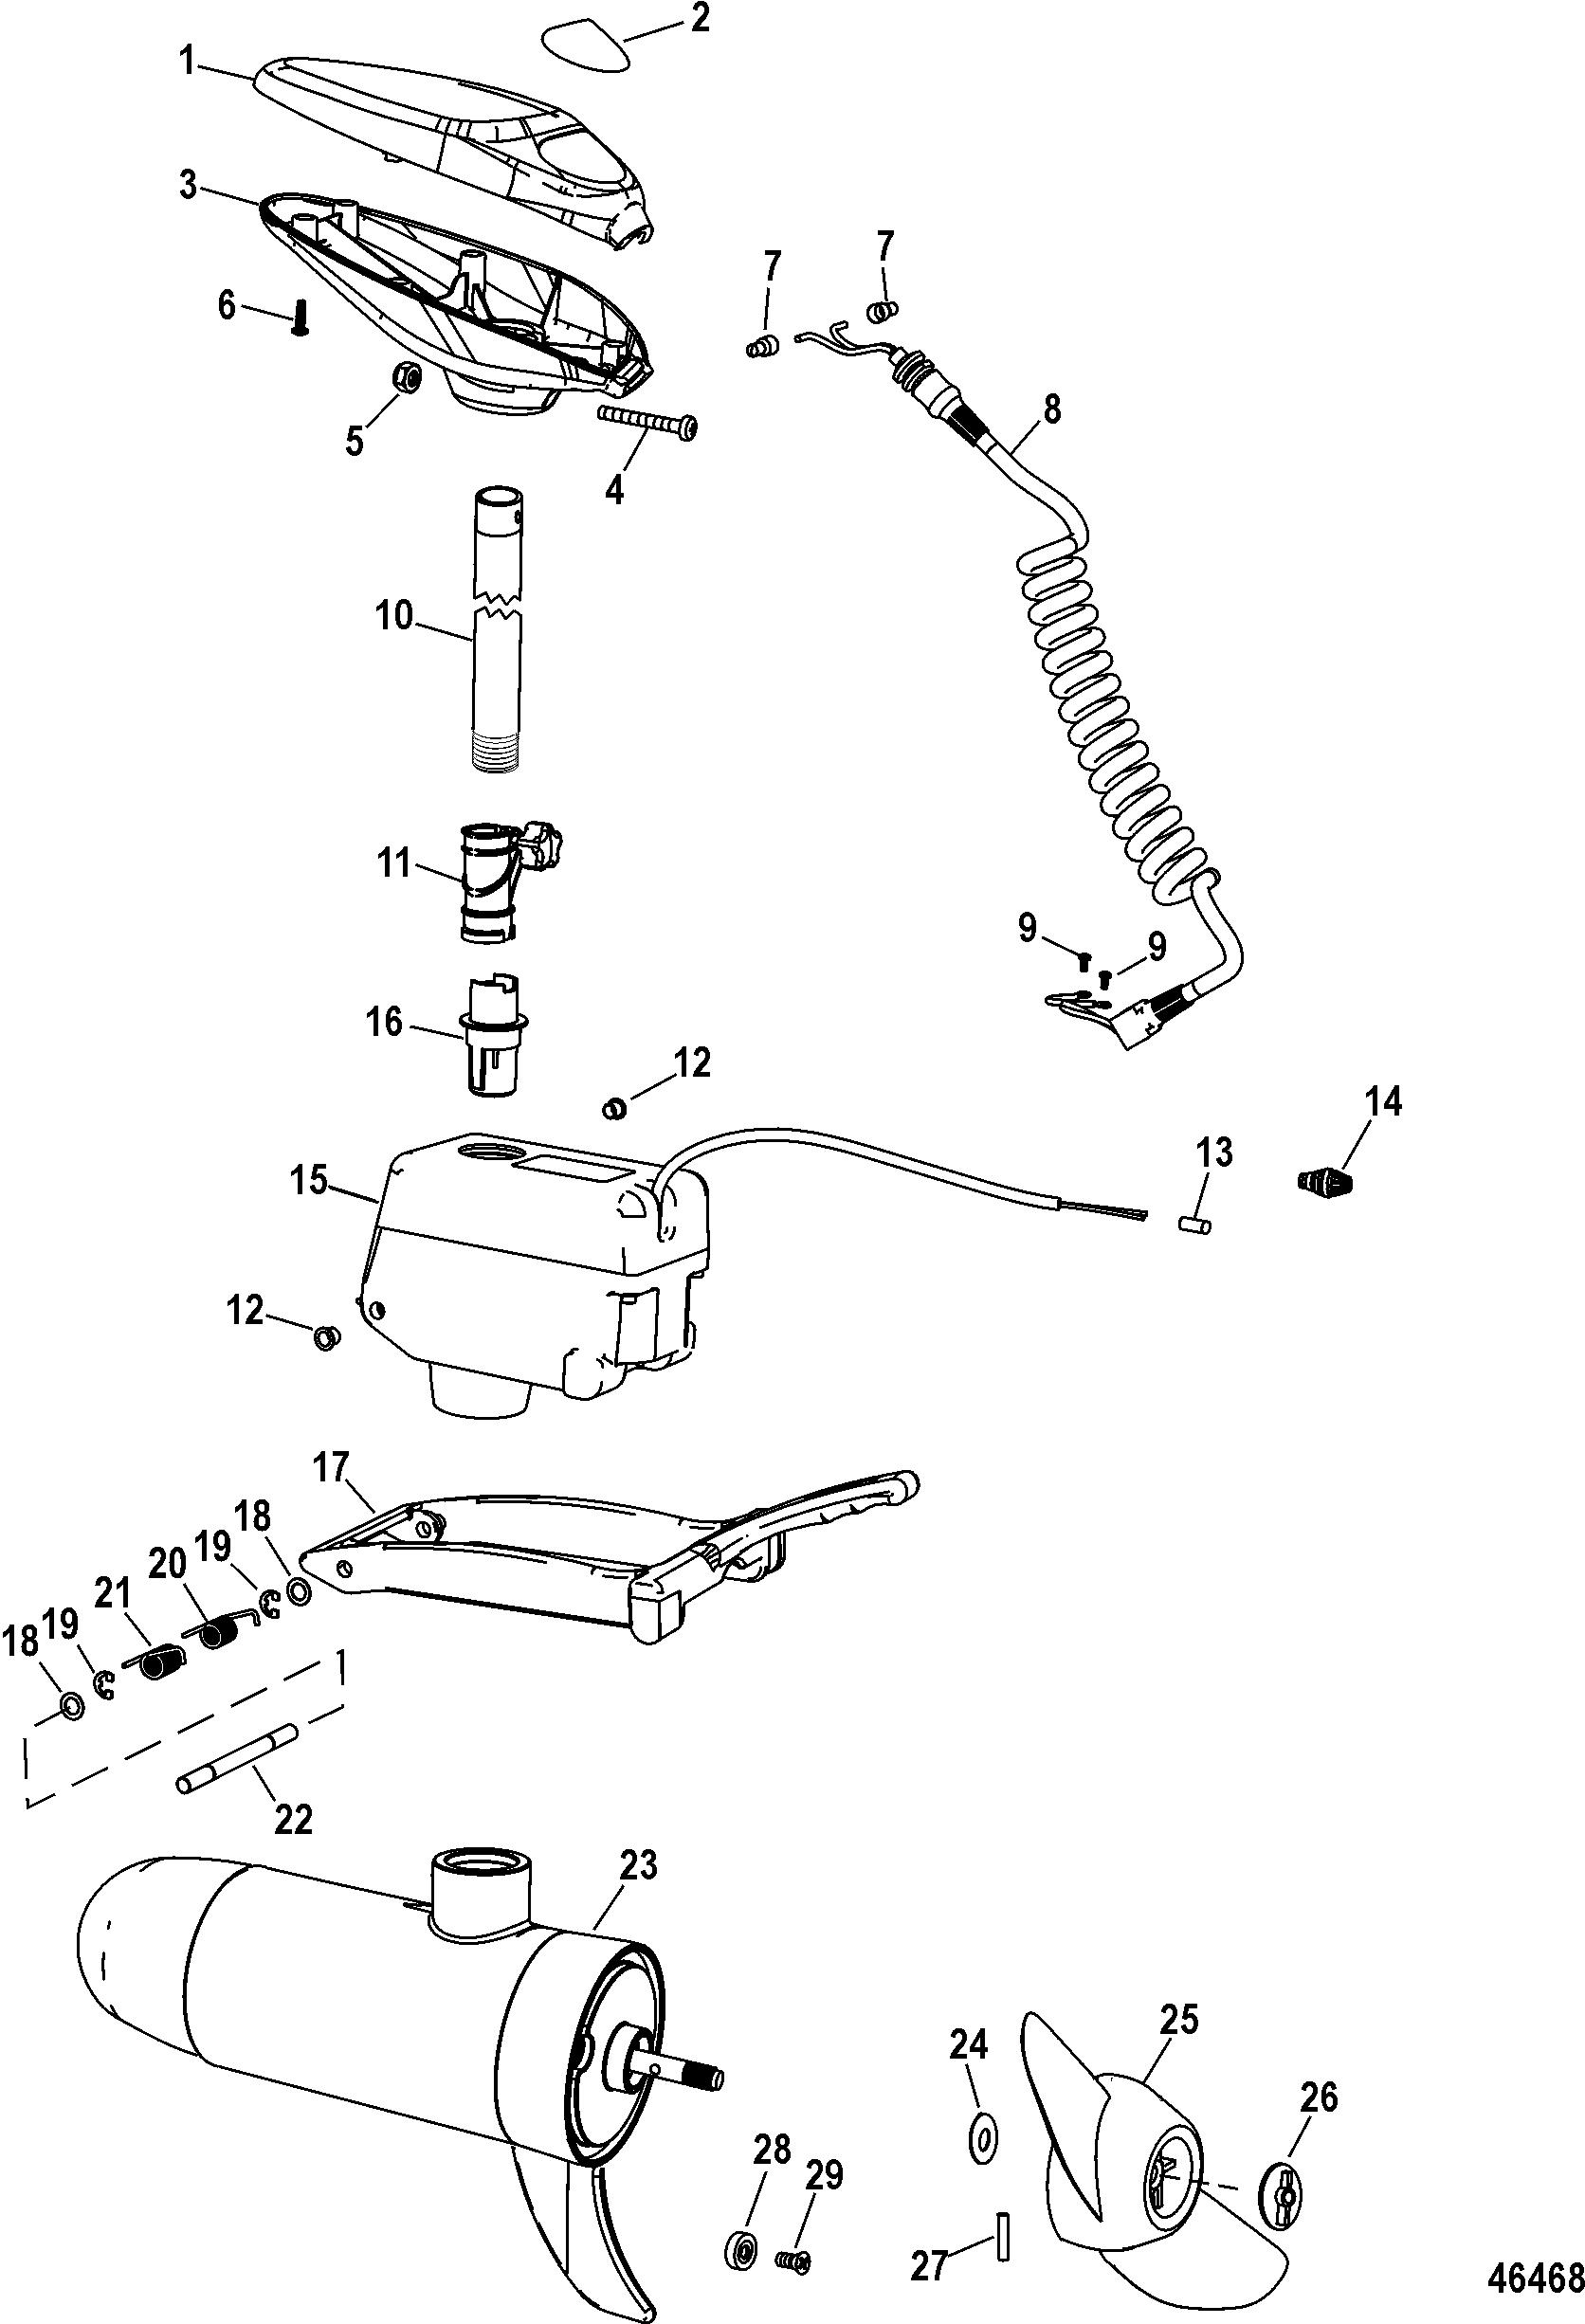 Motorguide Xi5 Parts Diagram